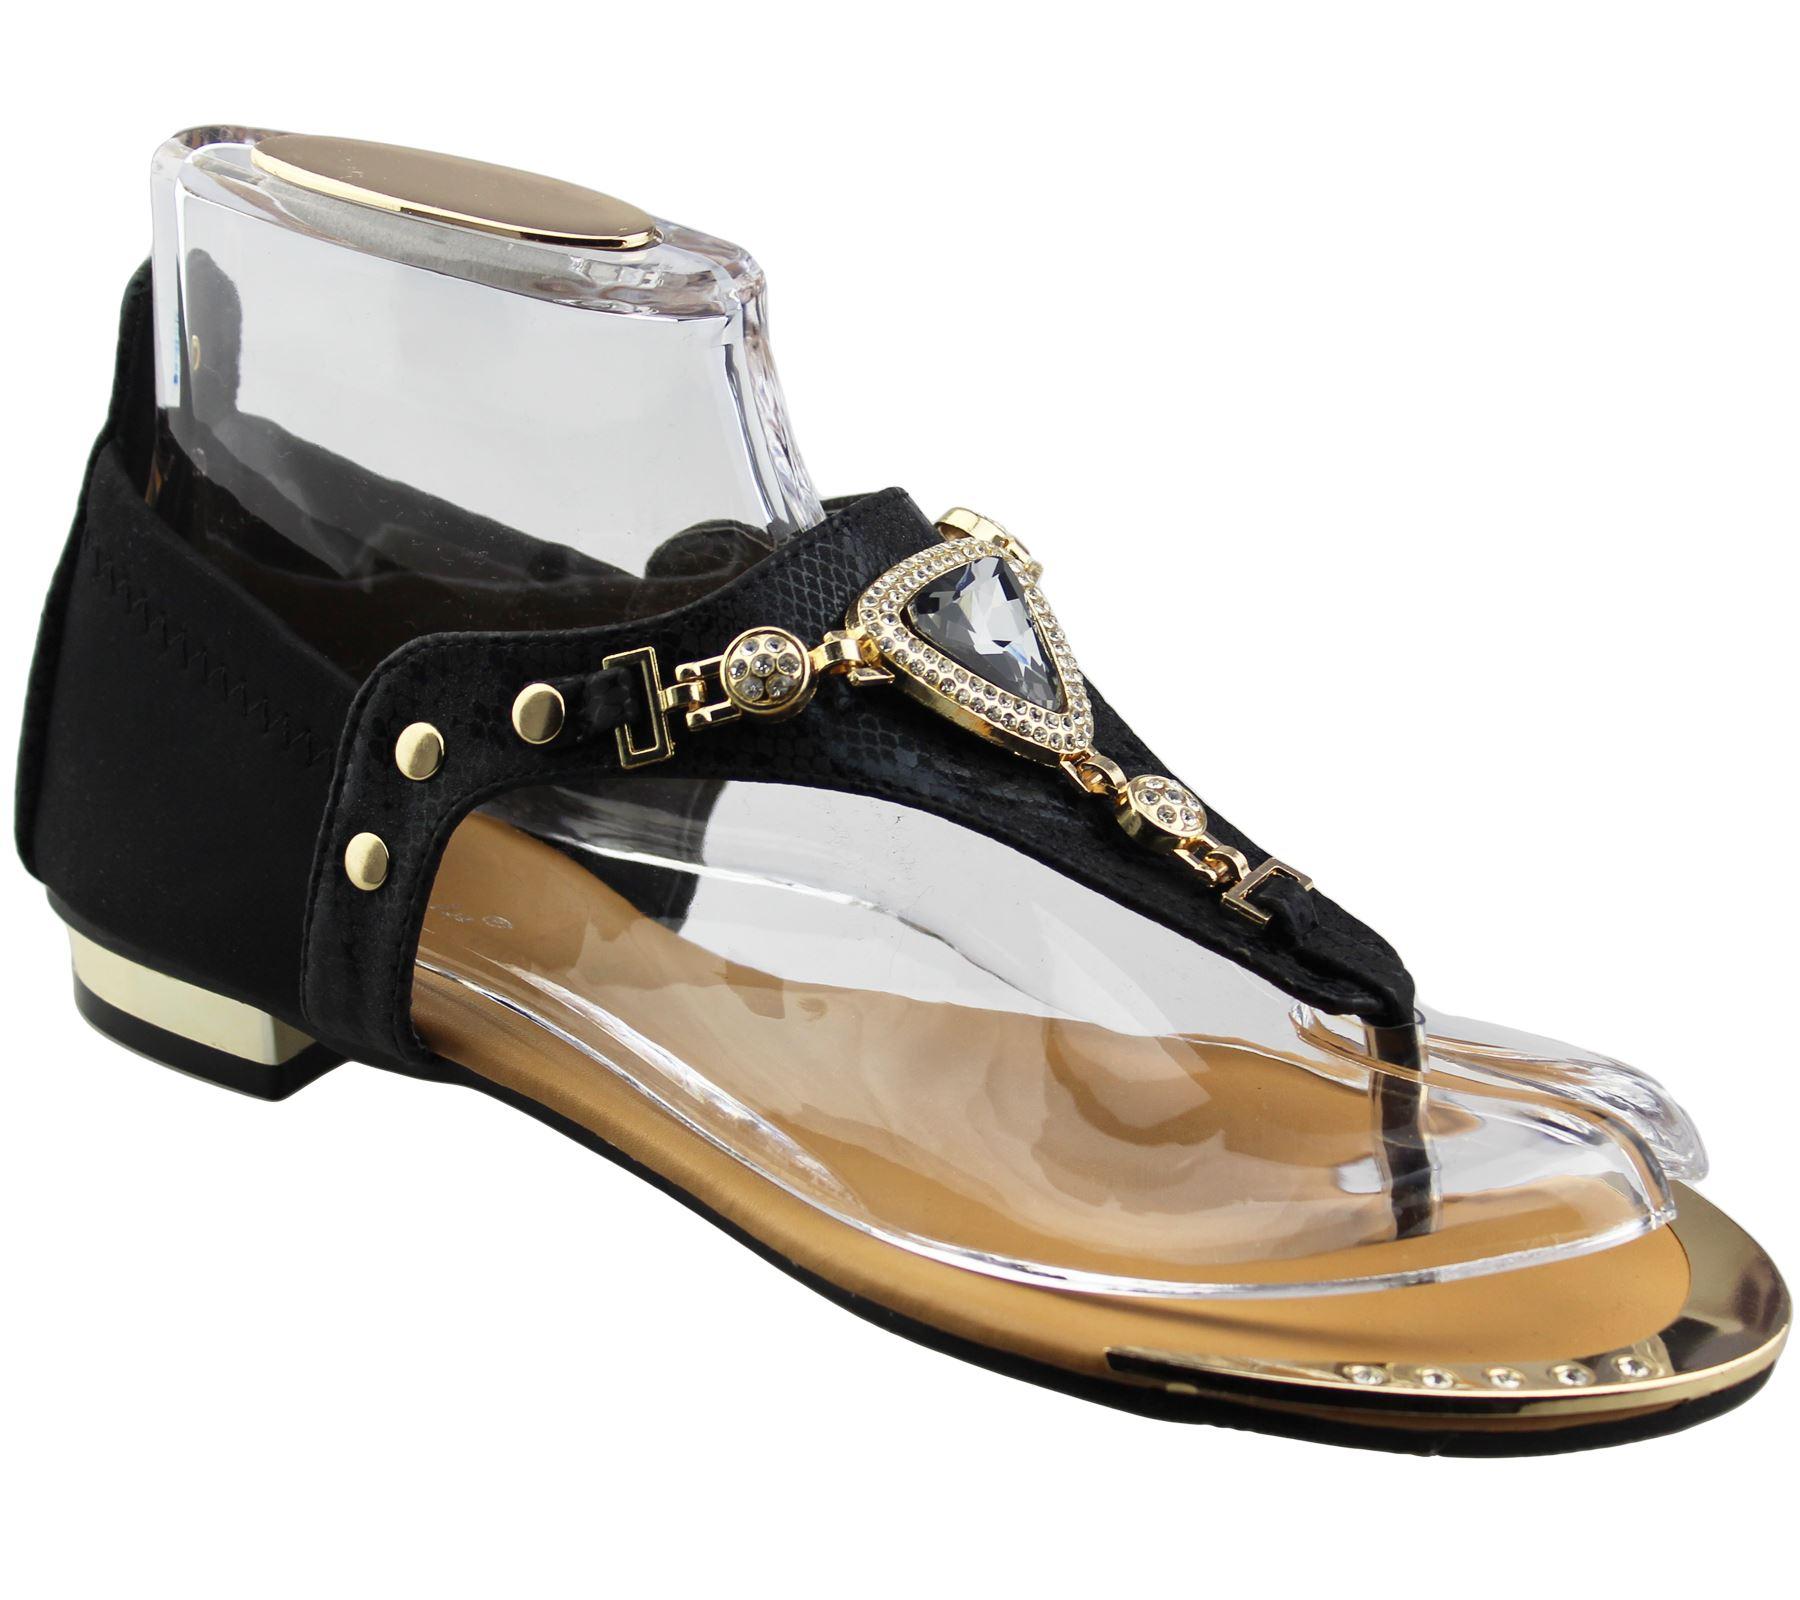 Womens-Flat-Summer-Sandals-Ladies-Diamante-Wedding-Toe-Post-Casual-Slipper thumbnail 3